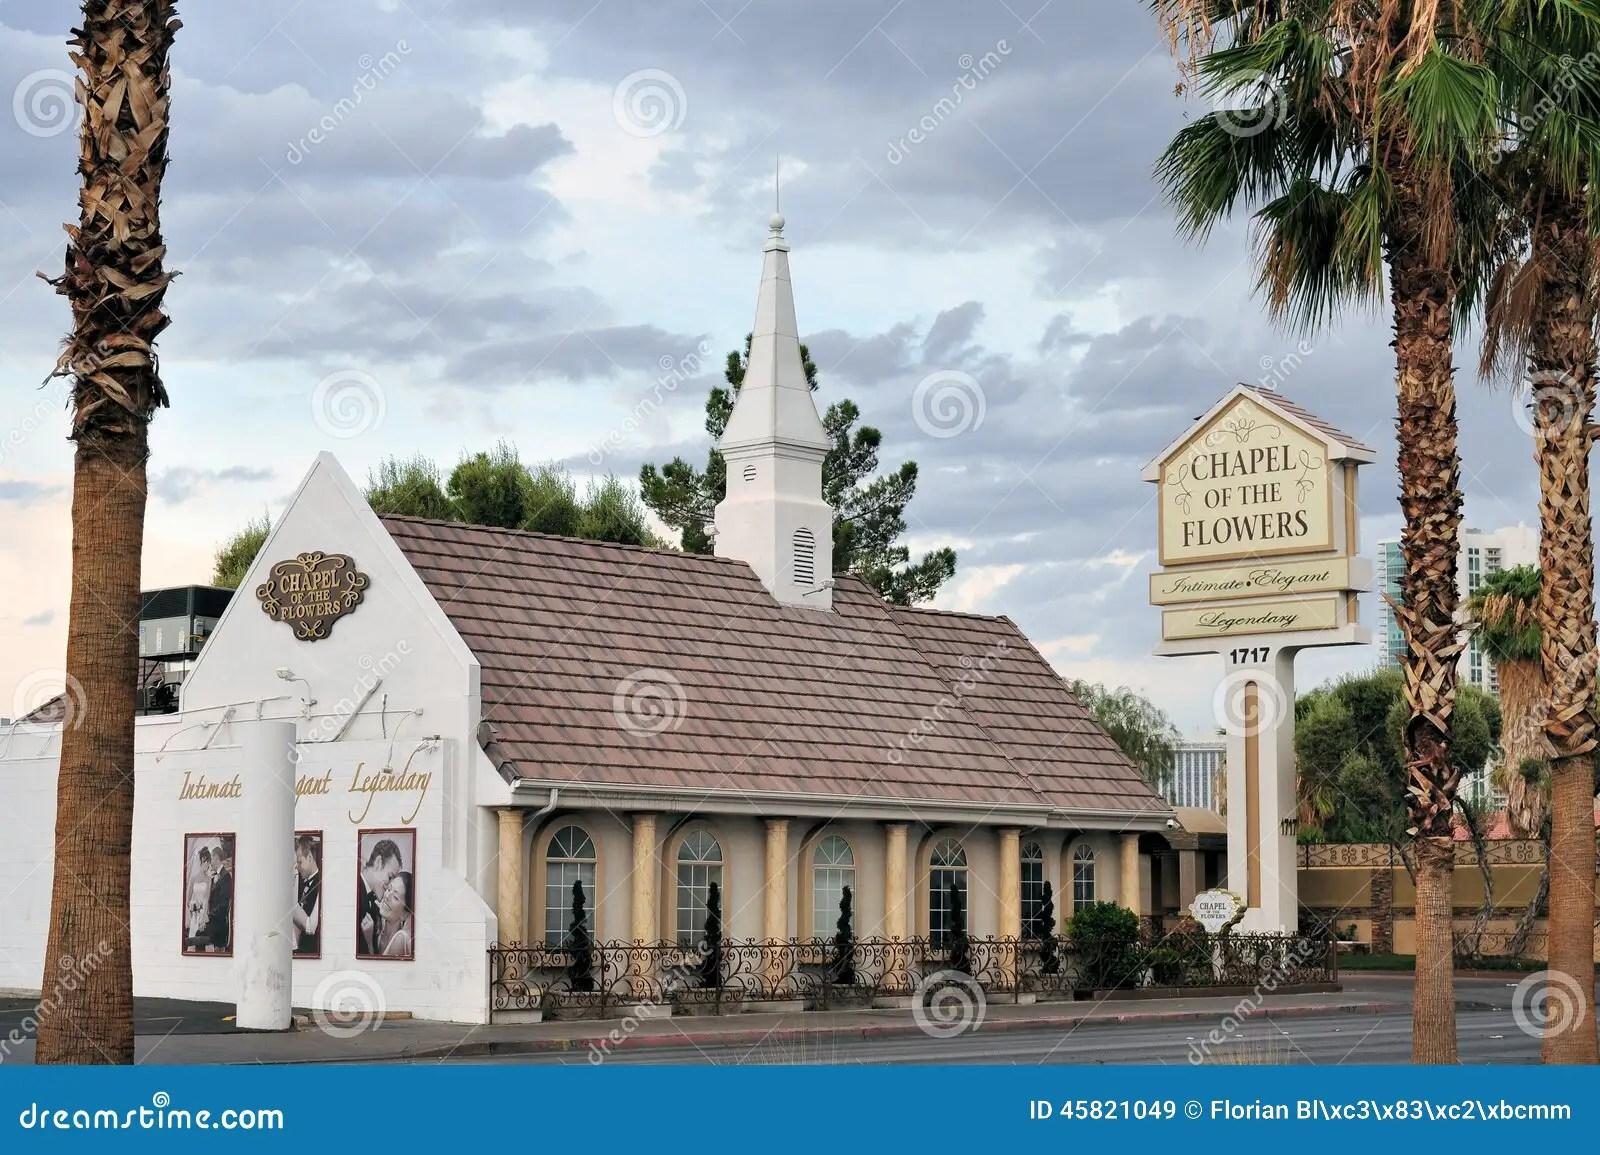 contact us vegas wedding chapels Viva Las Vegas Wedding Chapels is Located at Las Vegas Blvd South Las Vegas Nevada